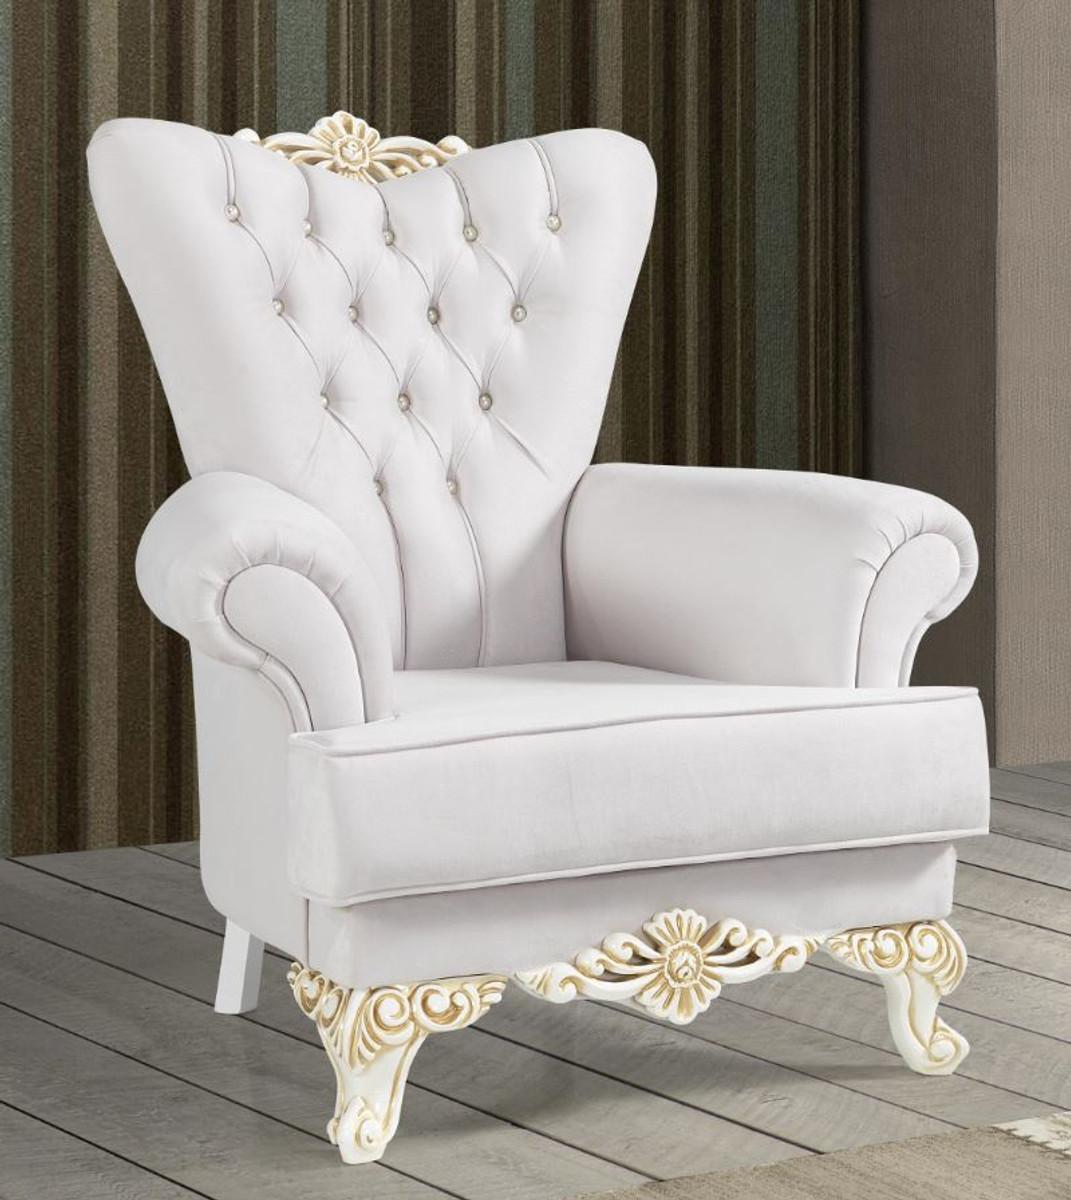 casa padrino fauteuil baroque gris clair blanc or 93 x 75 x h 107 cm fauteuil de salon noble avec strass mobilier baroque